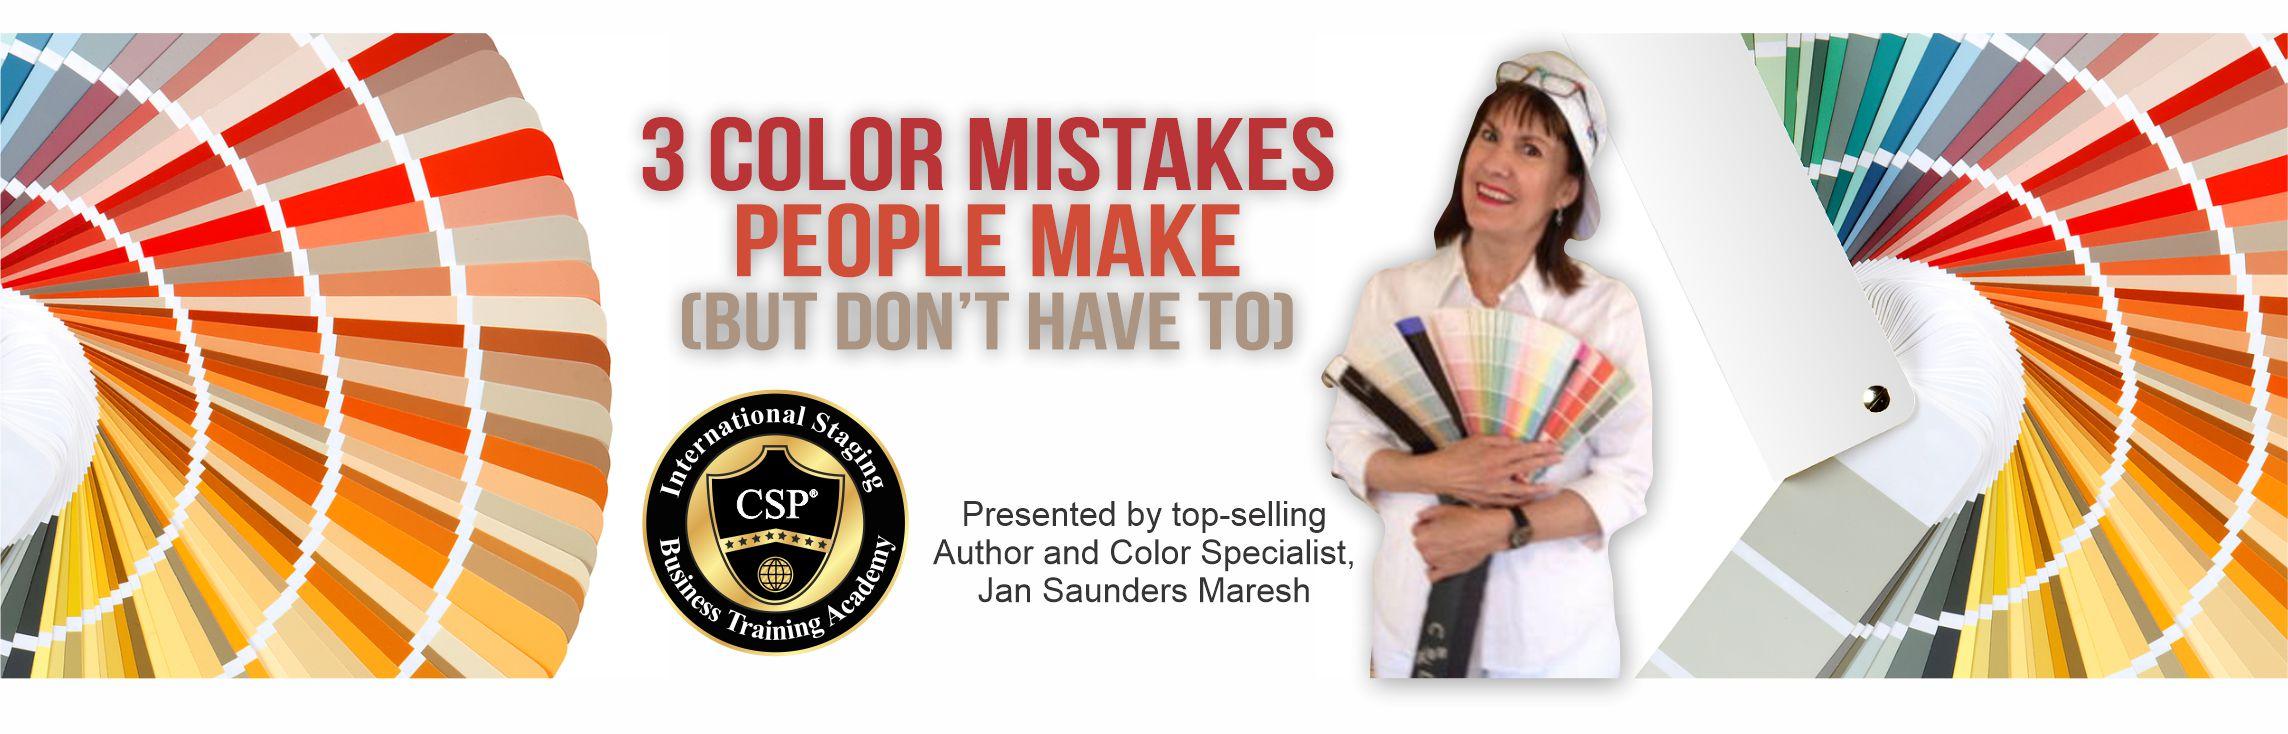 jan-maresh color specialist webinar banner